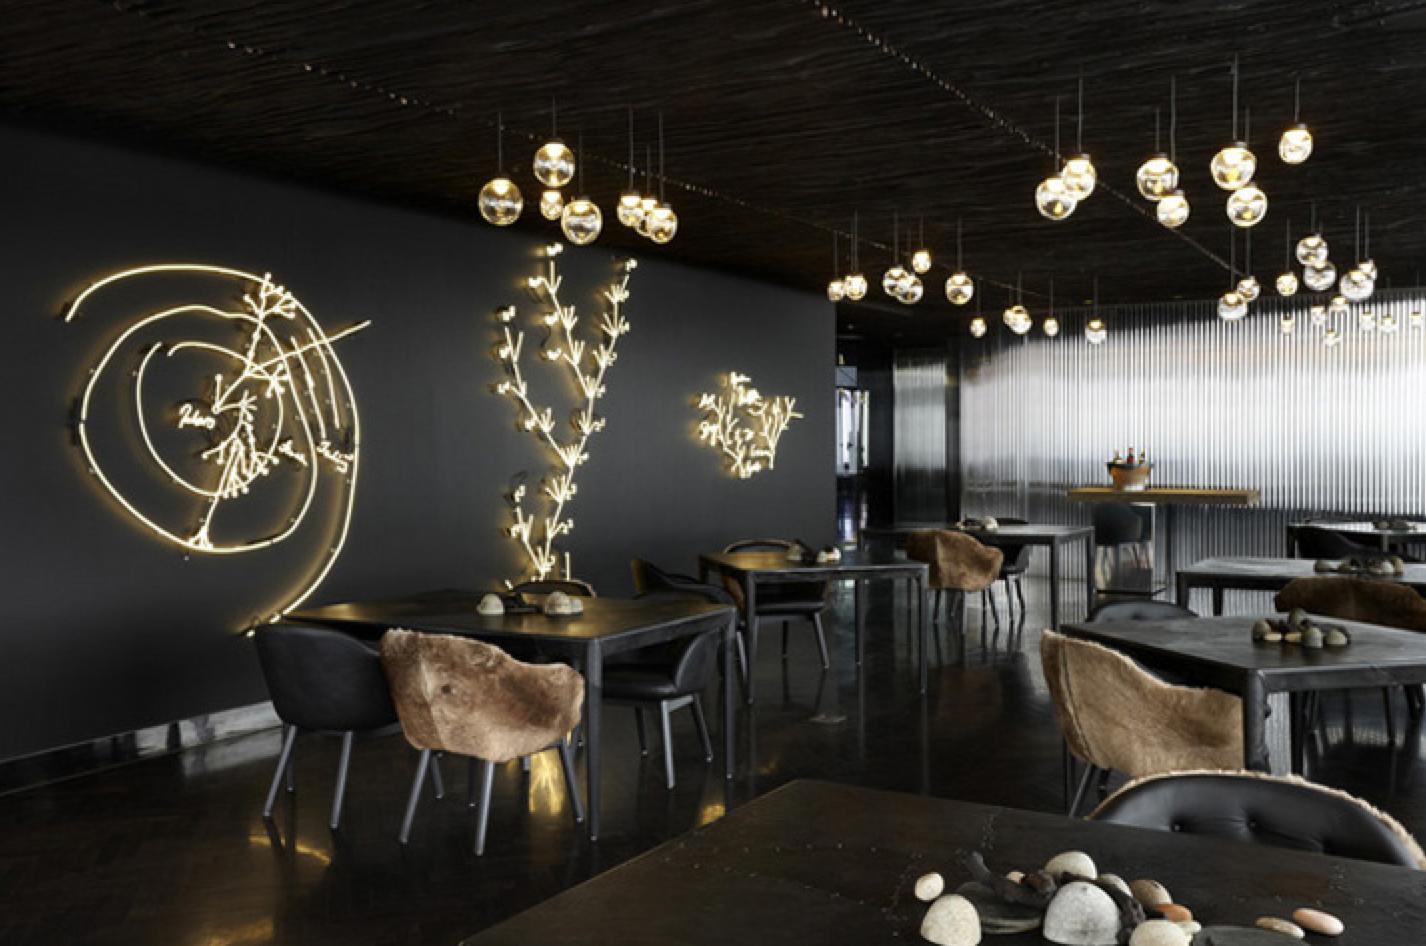 todd mitchell //decorandstyle.co.uk/interior-designer- · Modern LightingLighting DesignLighting IdeasRestaurant ... & todd mitchell http://decorandstyle.co.uk/interior-designer-todd ... azcodes.com